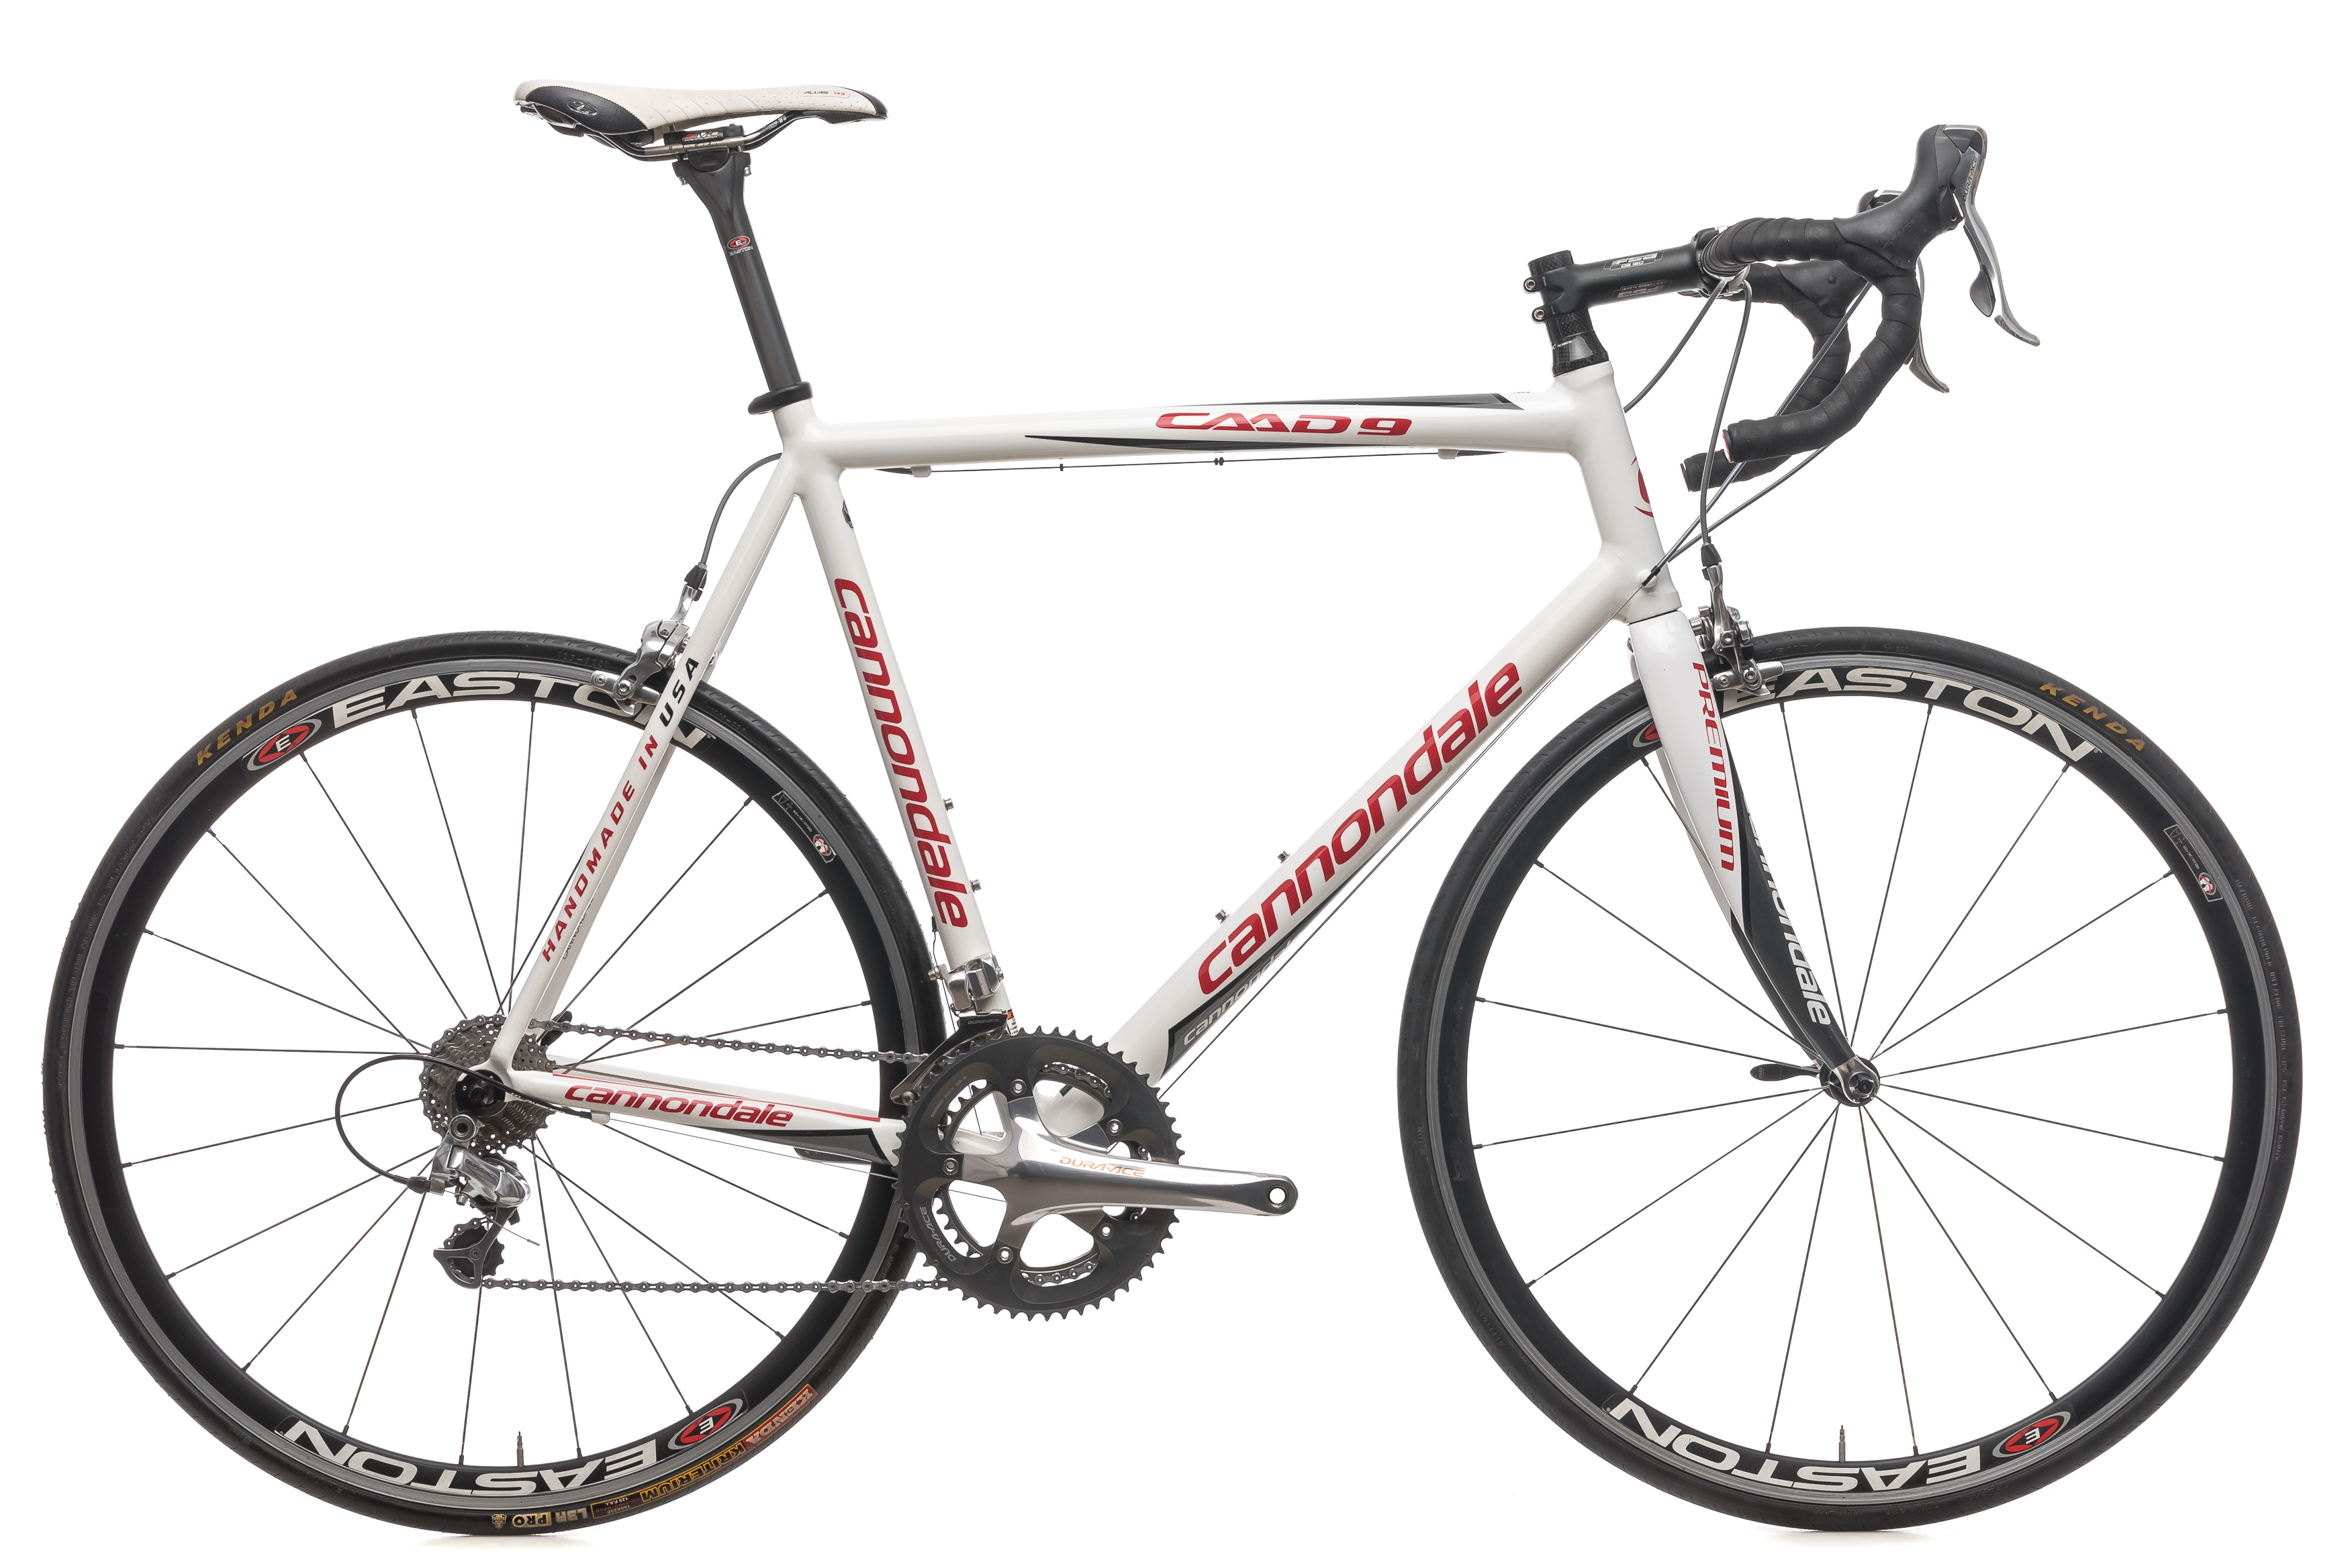 c7883807167 2010 Cannondale CAAD9 5 Road Bike 60cm Aluminum Shimano Dura-Ace 7800